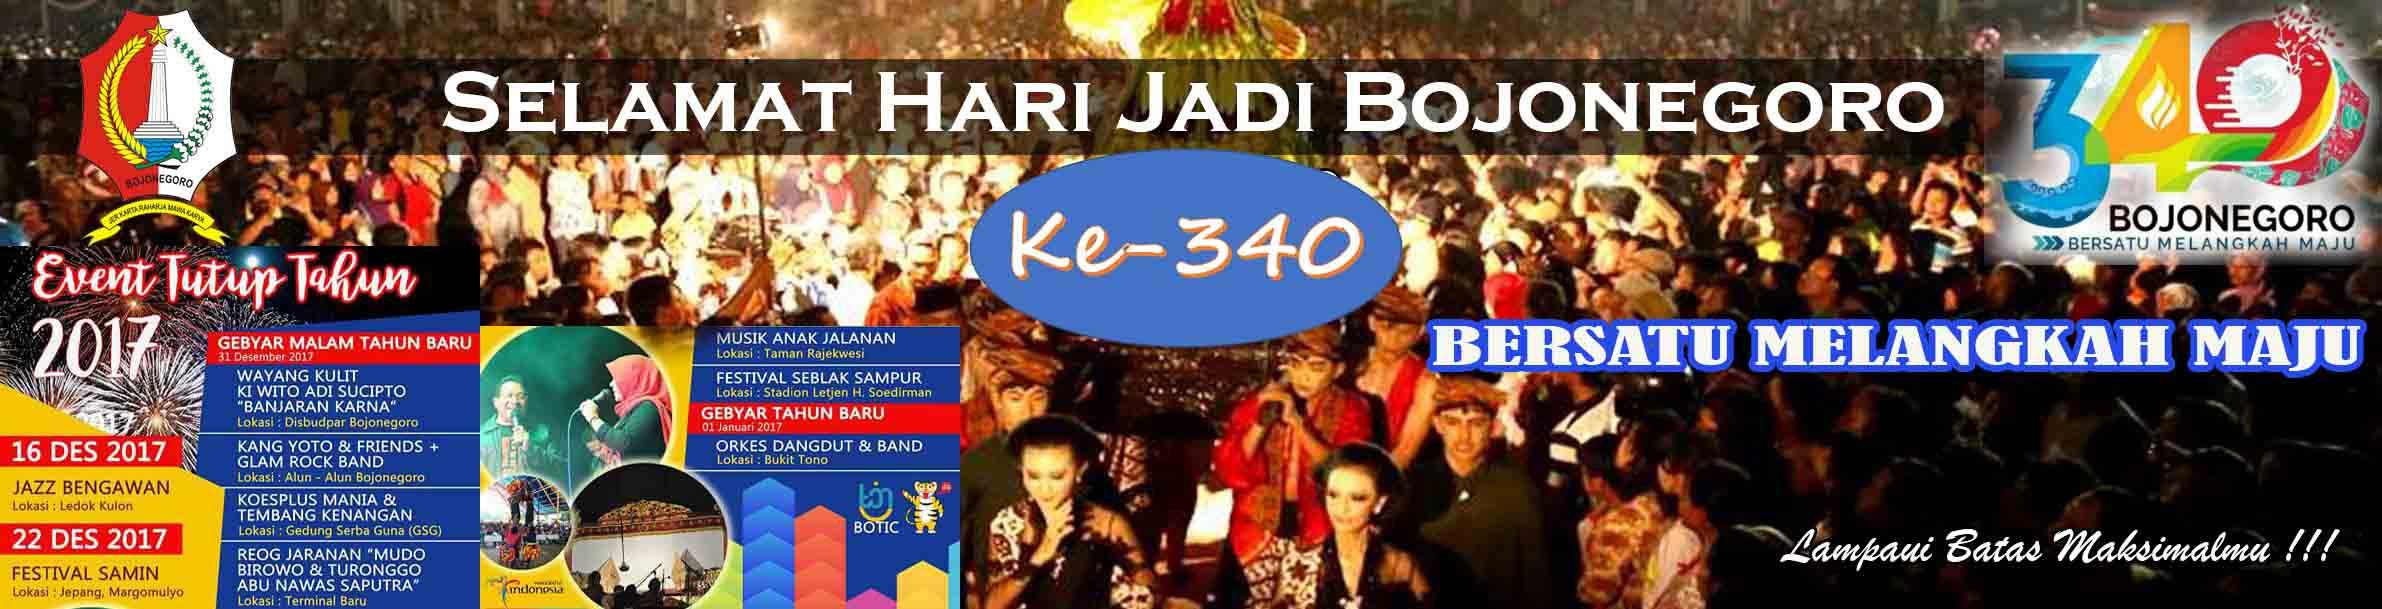 SELAMAT HARI JADI BOJONEGORO <BR>KE-340